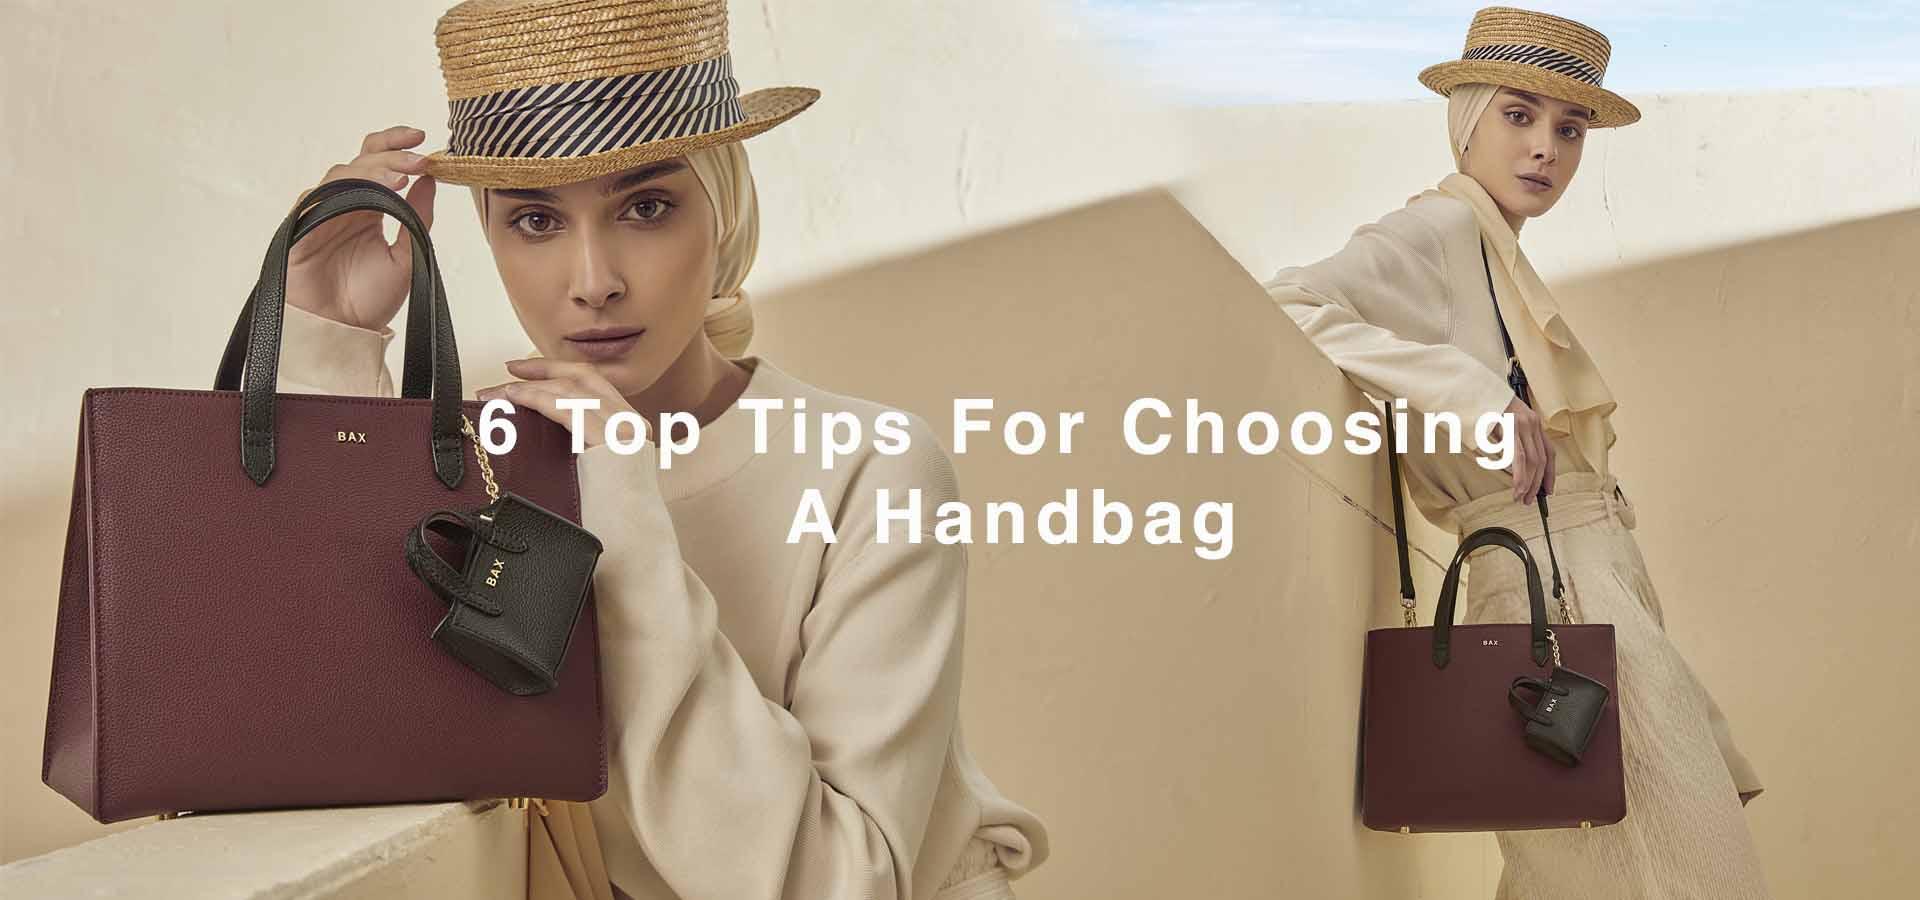 6 TOP TIPS FOR CHOOSING A HANDBAG